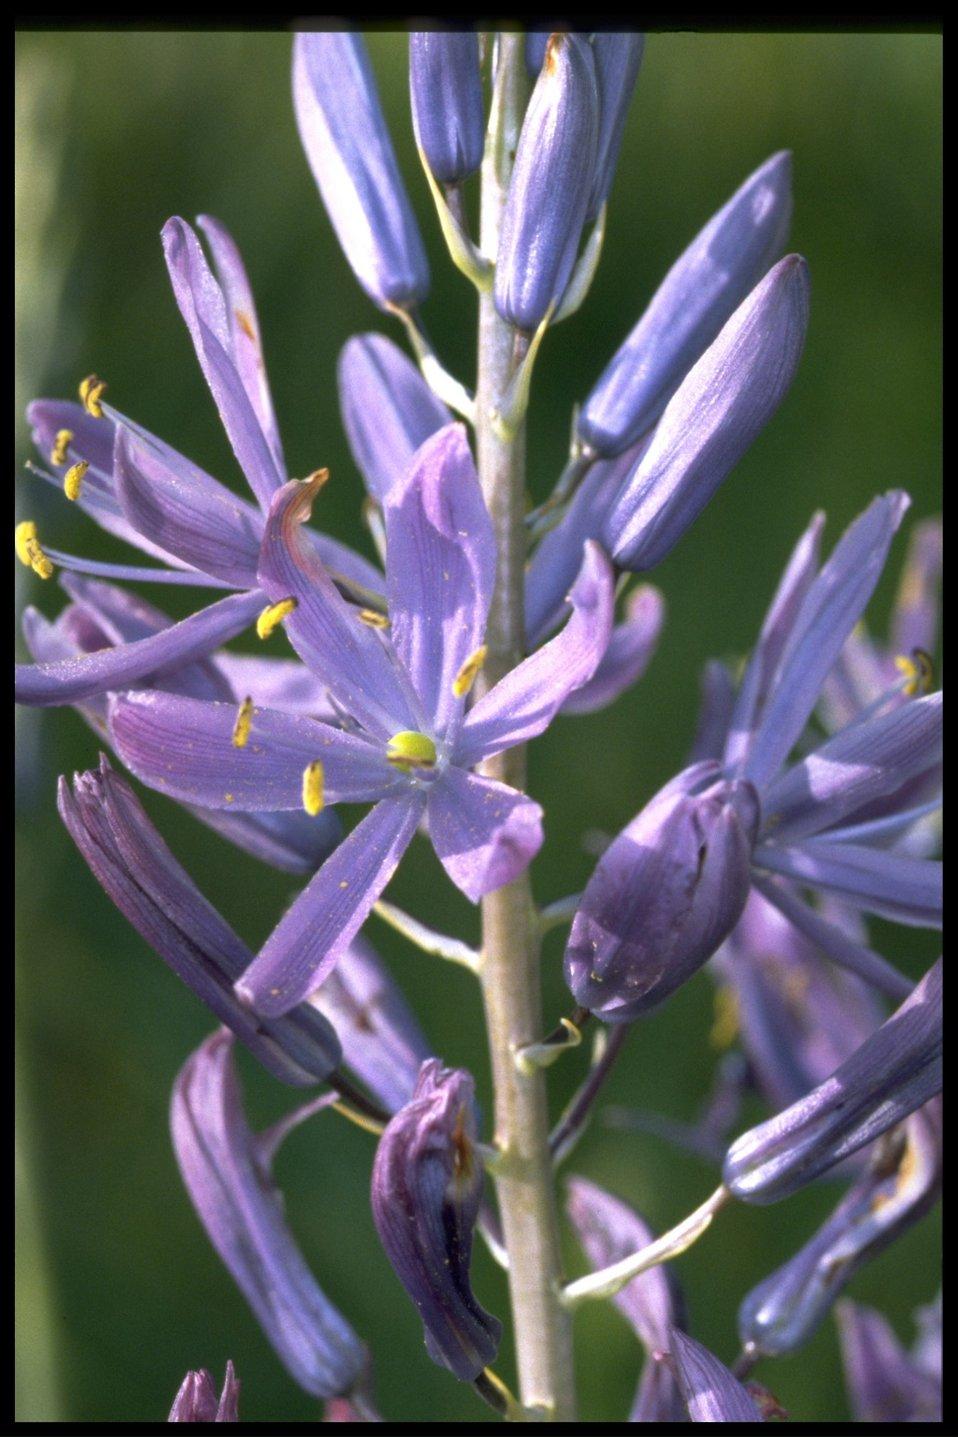 Closeup shot of Camassia quamash.